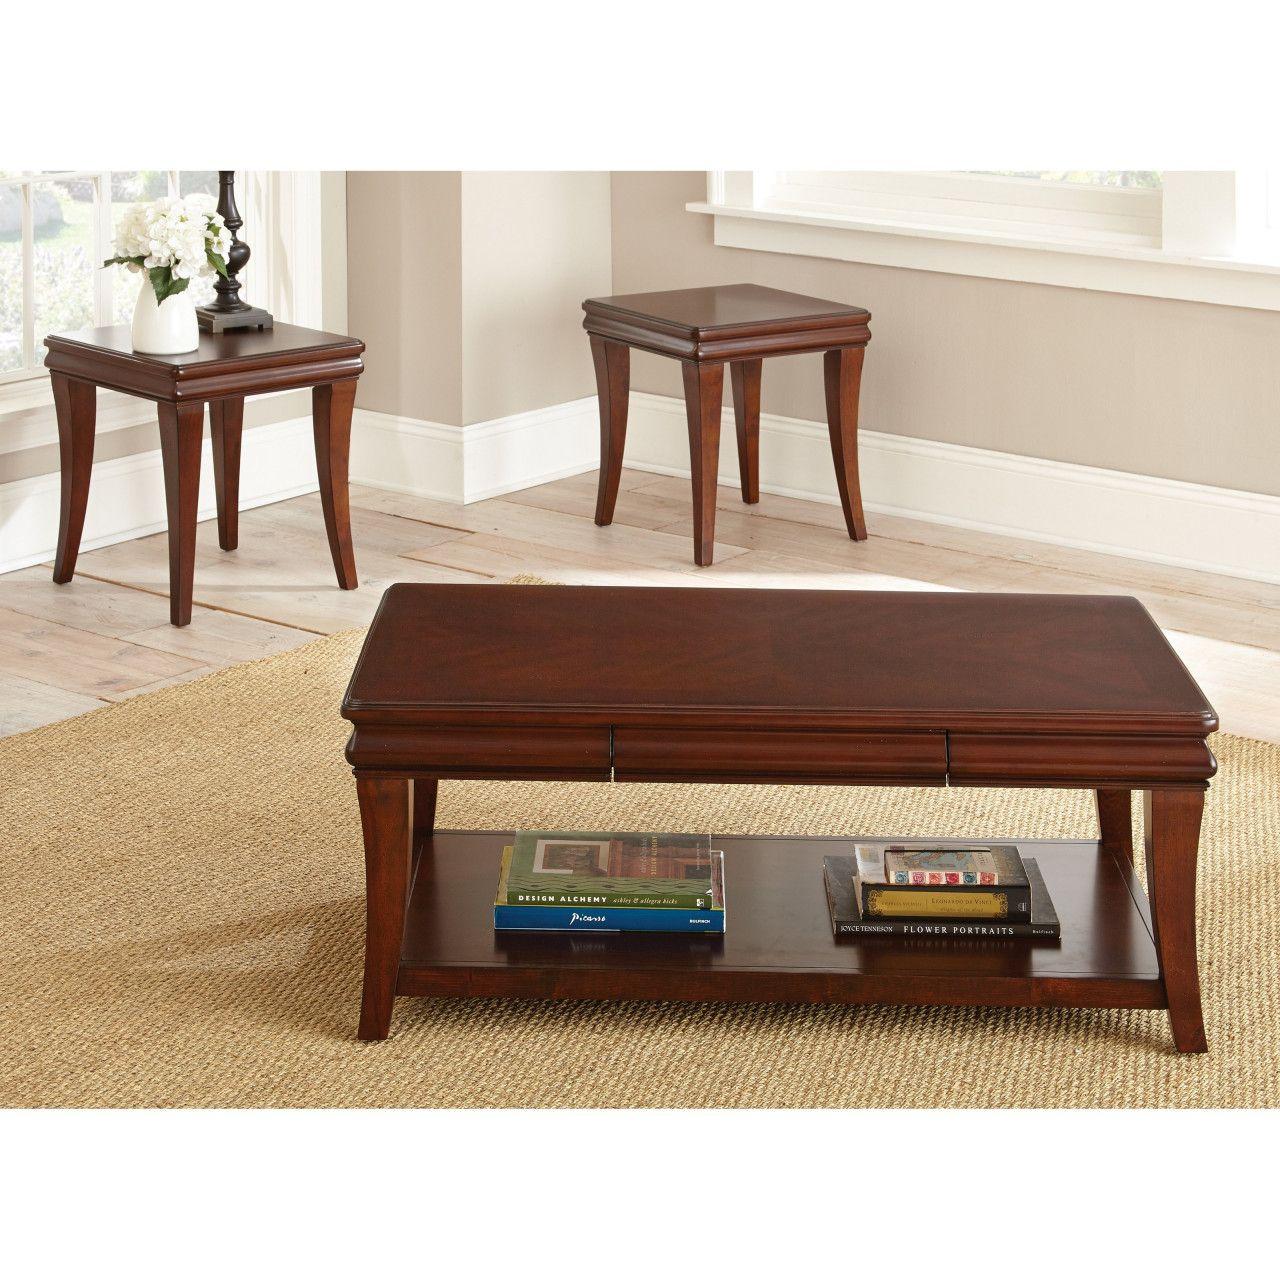 77 Elegant Steve Silver Coffee Table 2020 Coffee Table 3 Piece Coffee Table Set Accent Table Sets [ 1280 x 1280 Pixel ]